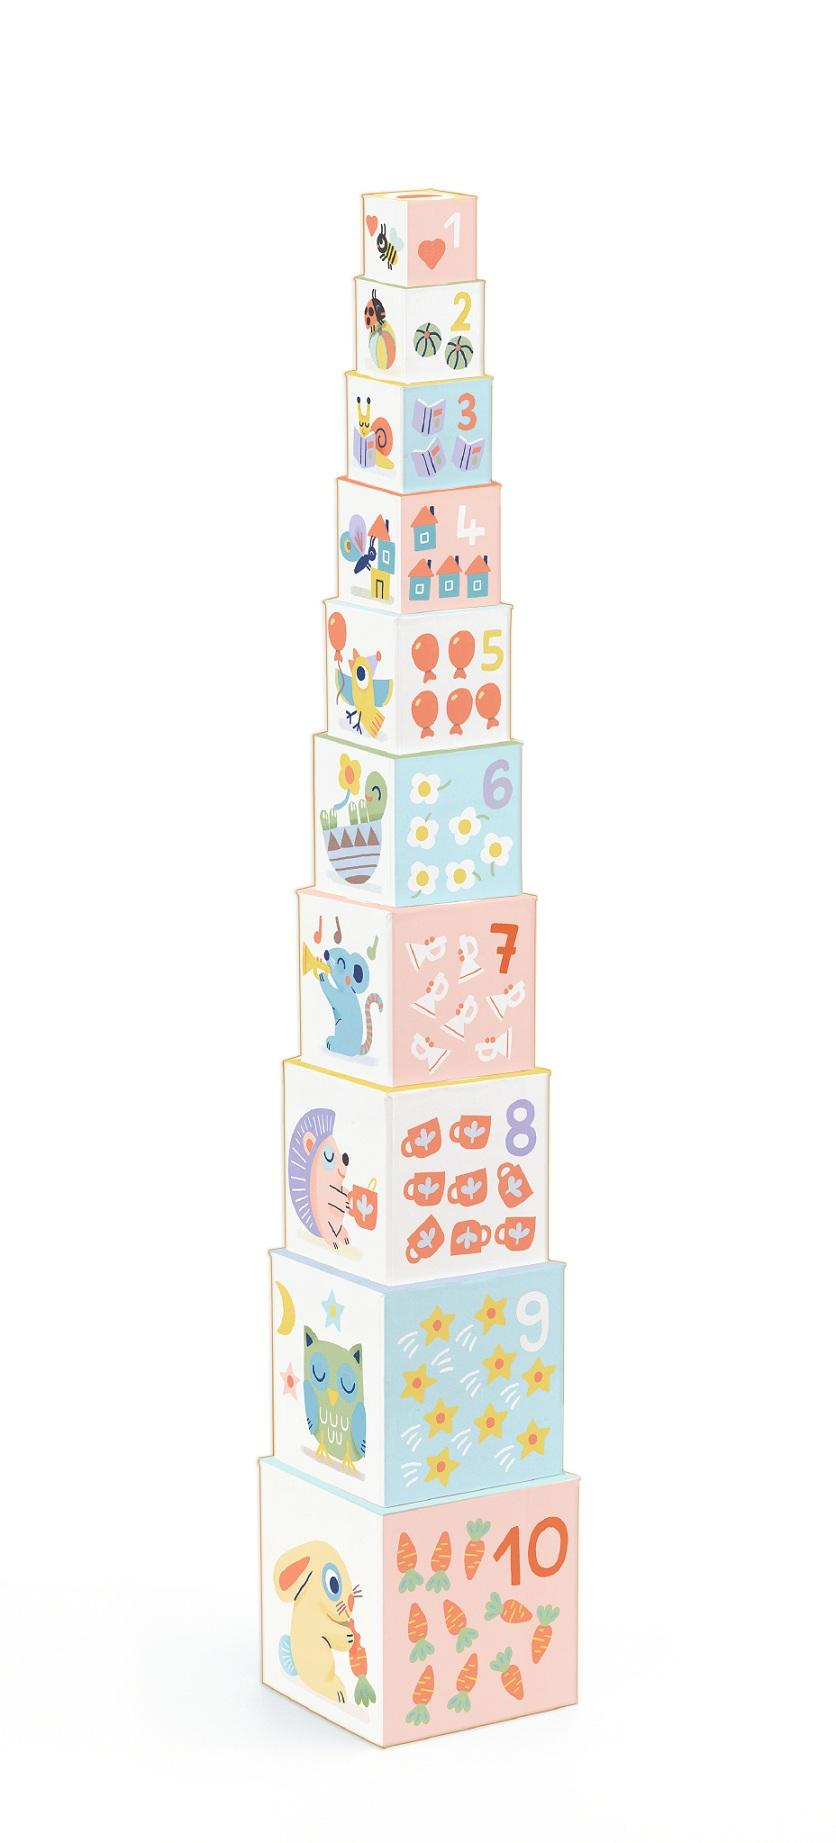 Кубики-пирамидка - Блоки, Djeco  - купить со скидкой